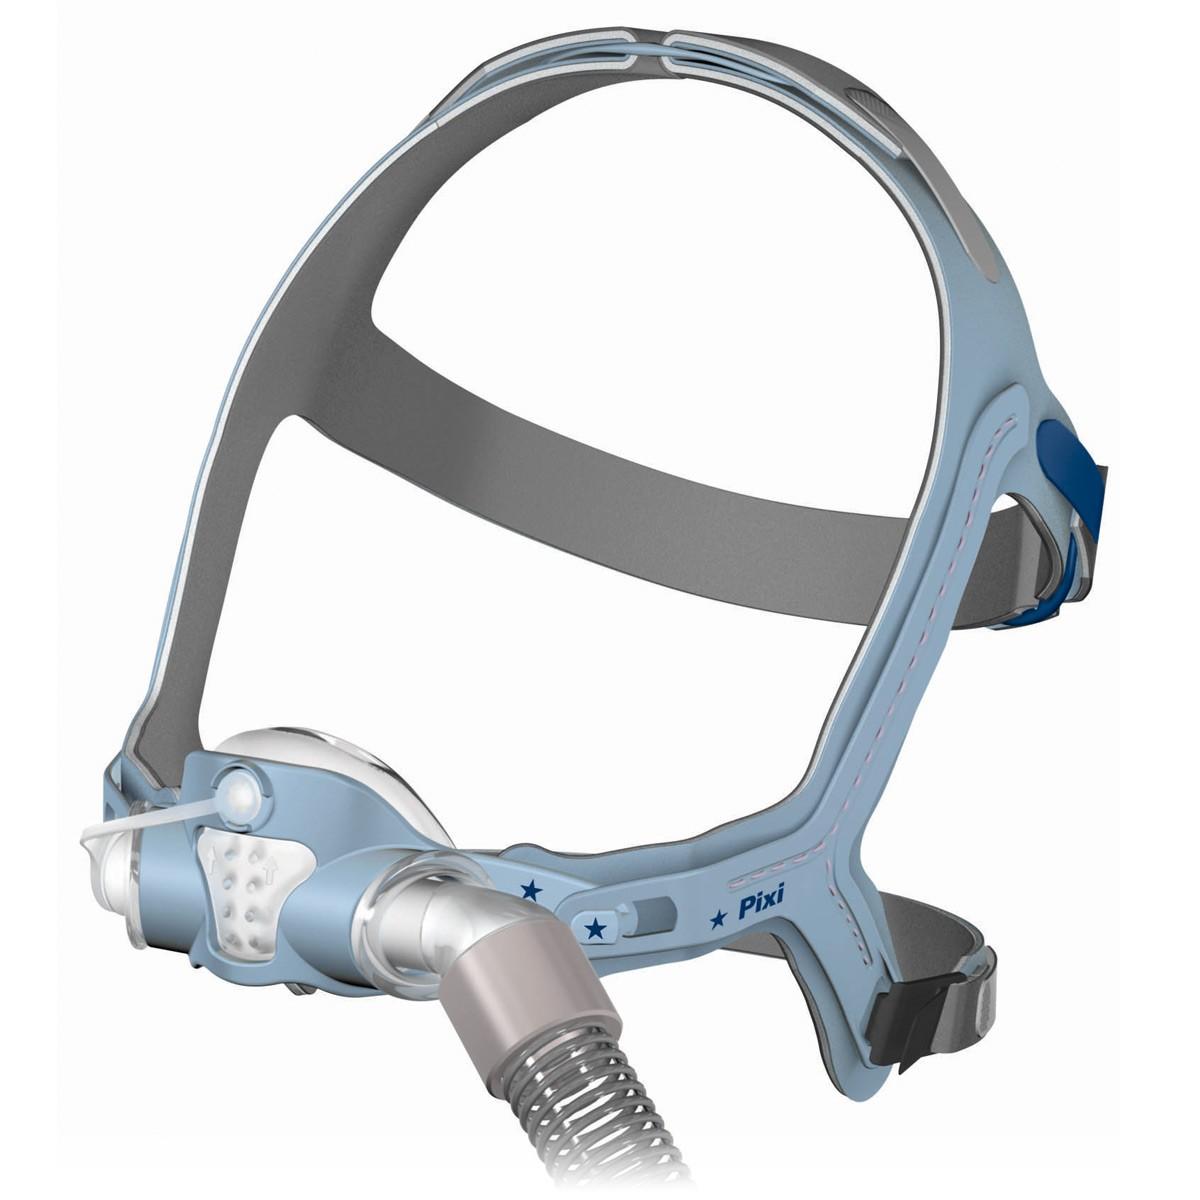 Pixi Pediatric Nasal CPAP Mask with Headgear